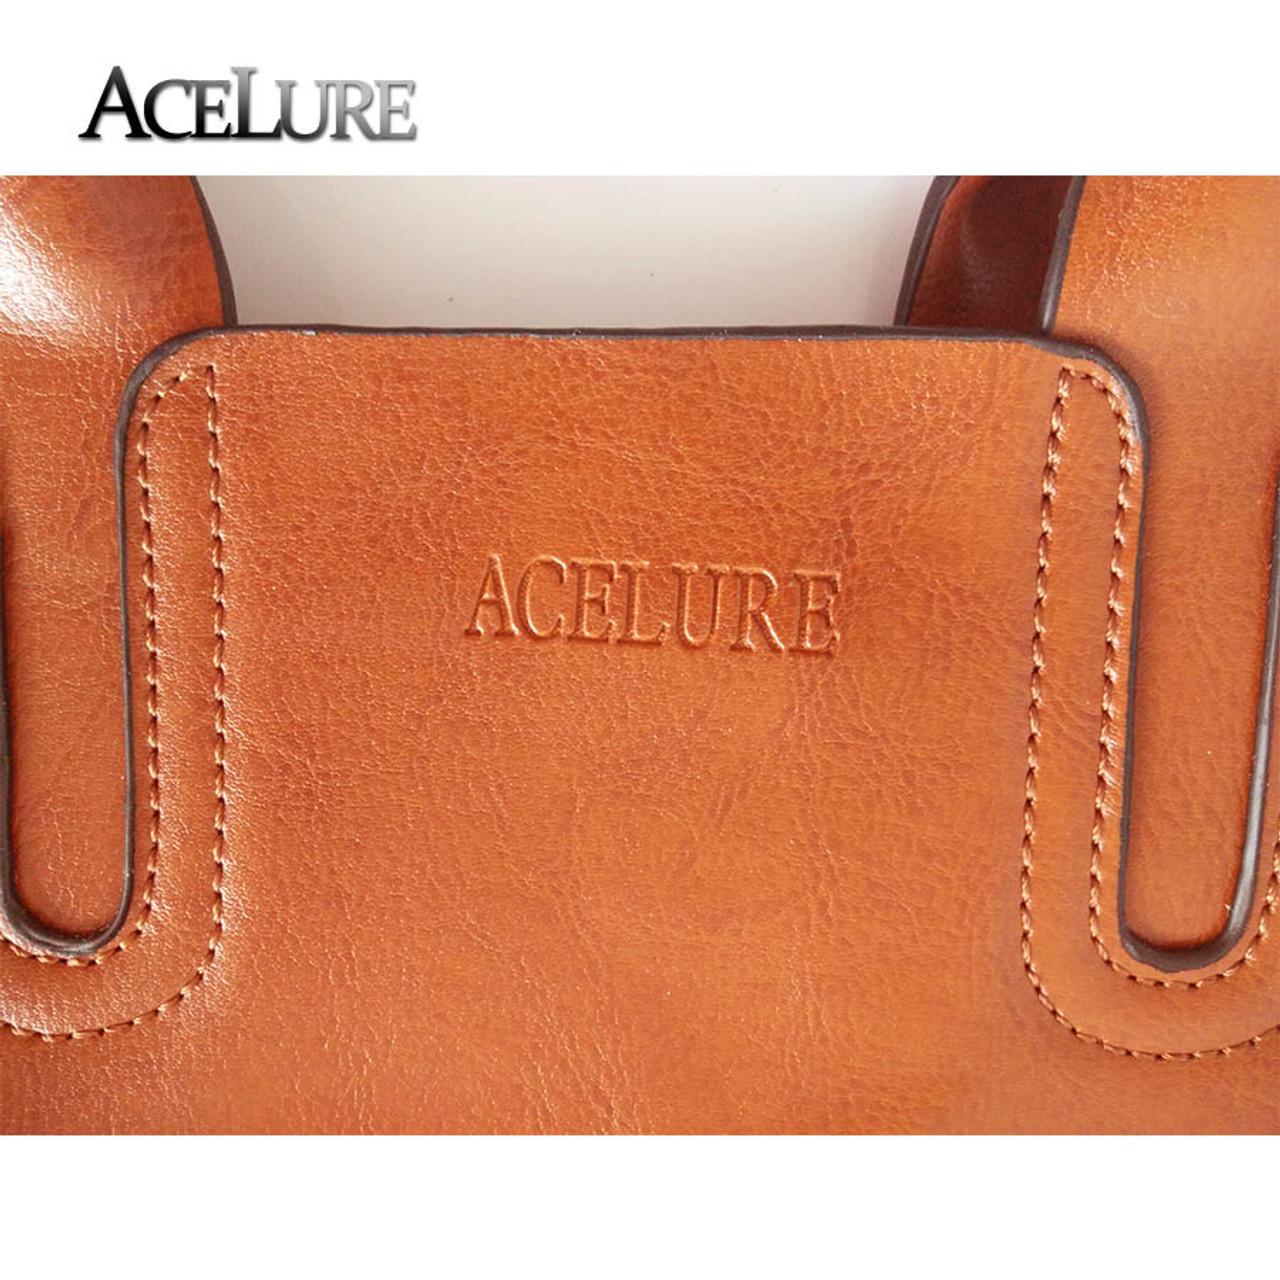 d02d04171385 ... ACELURE Leather Handbags Big Women Bag High Quality Casual Female Bags  Trunk Tote Spanish Brand Shoulder ...